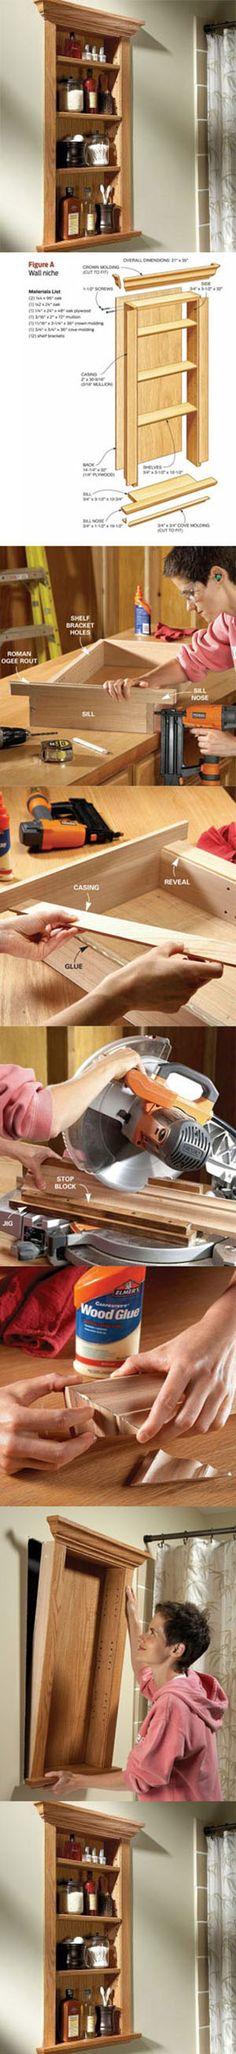 Great Home Decor Idea | DIY & Crafts Tutorials